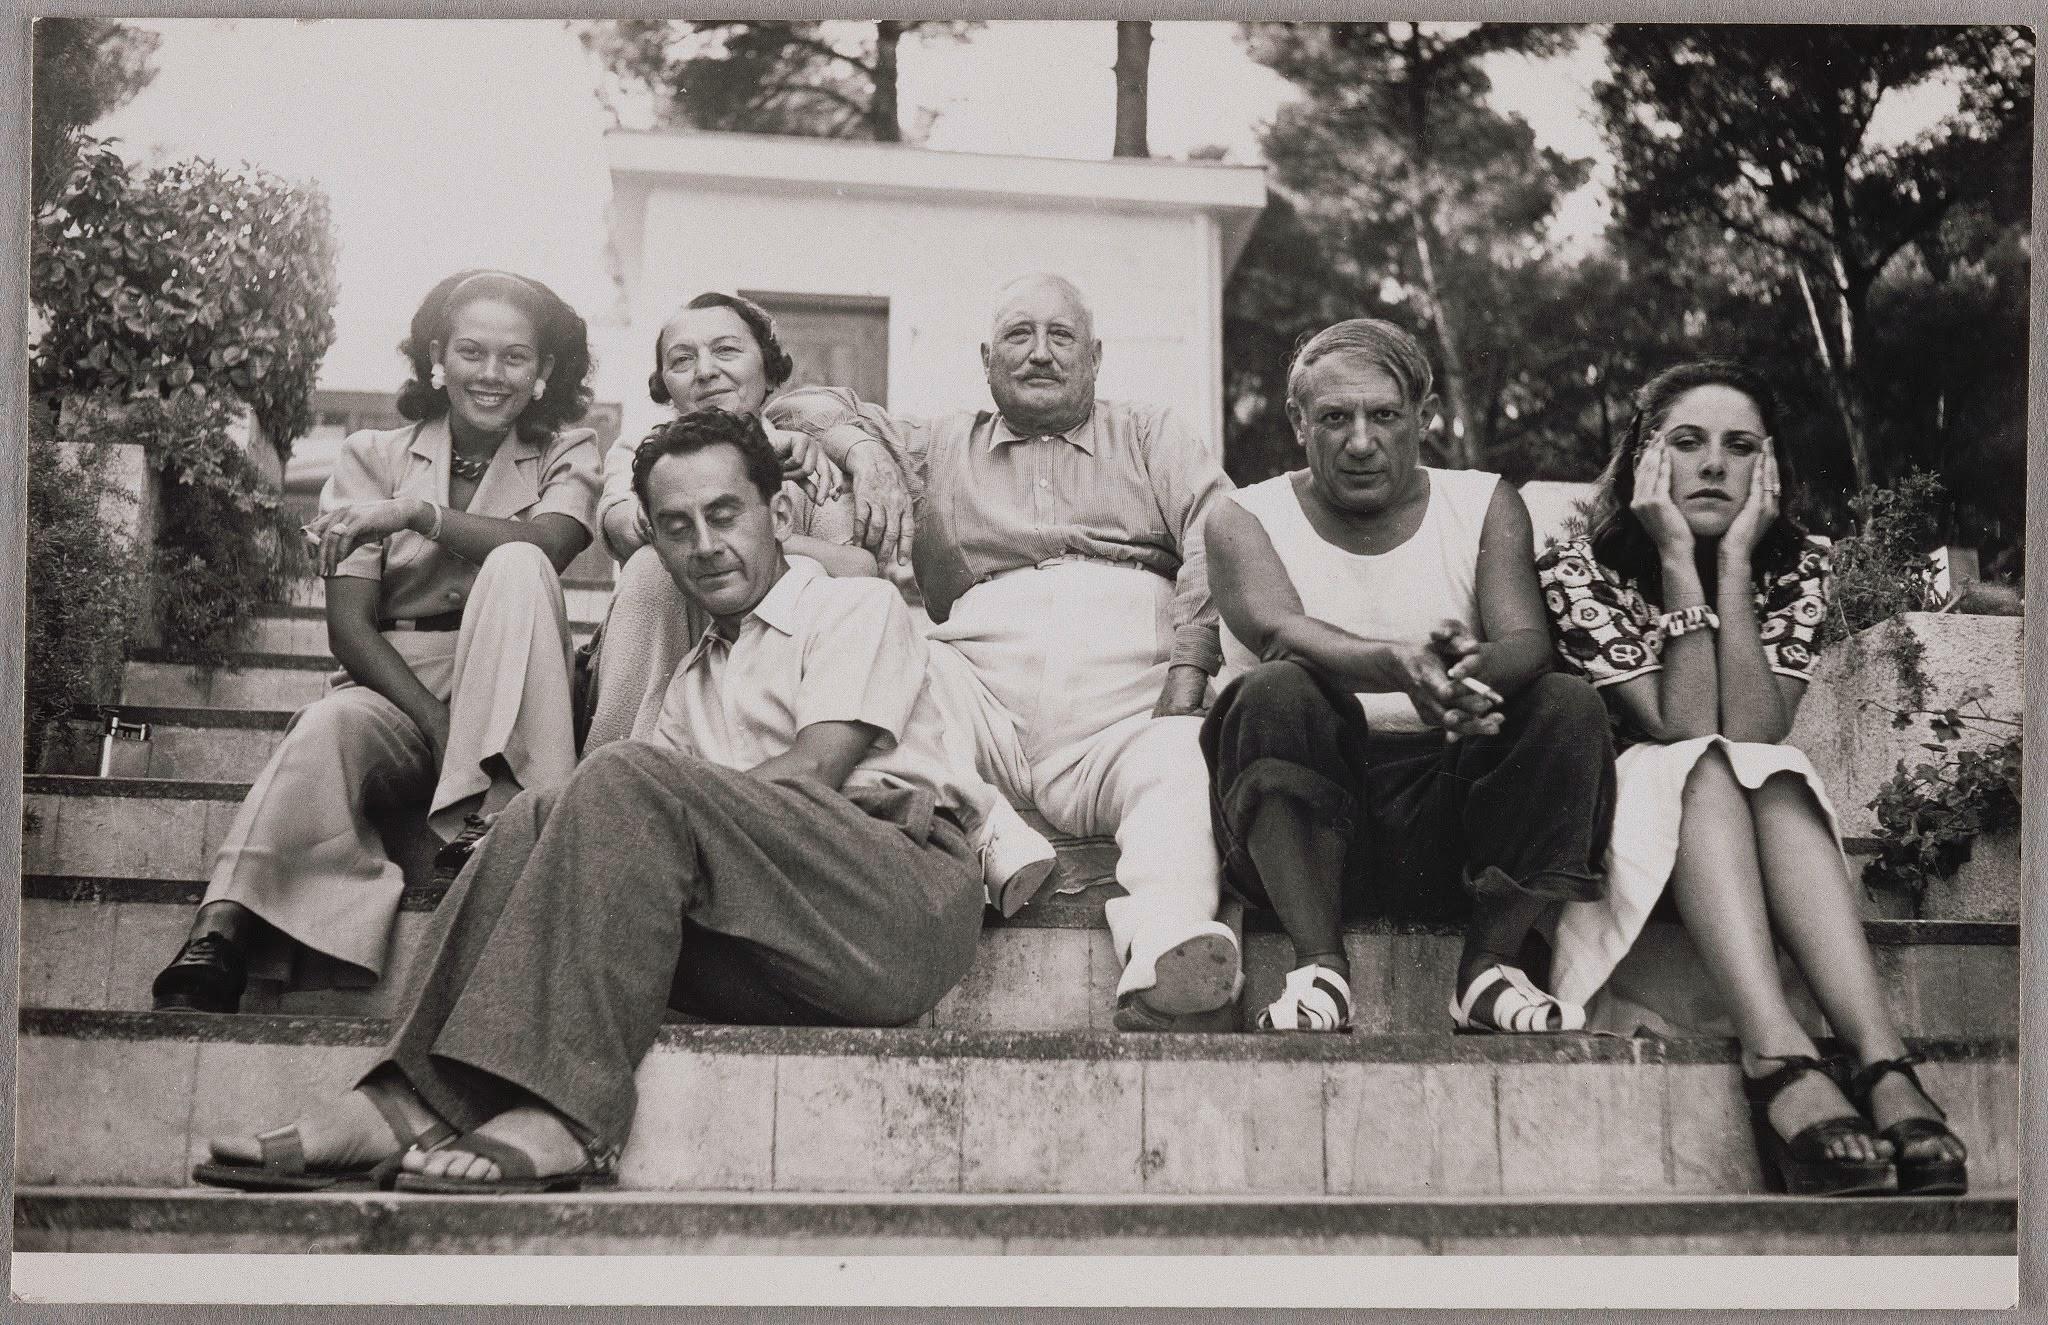 Ady Fidelin, Marie-Cuttoli, Man Ray, Picasso and Dora Maar, 1937 by Man Ray ©Man Ray Trust ADAGP Paris and DACS London 2017